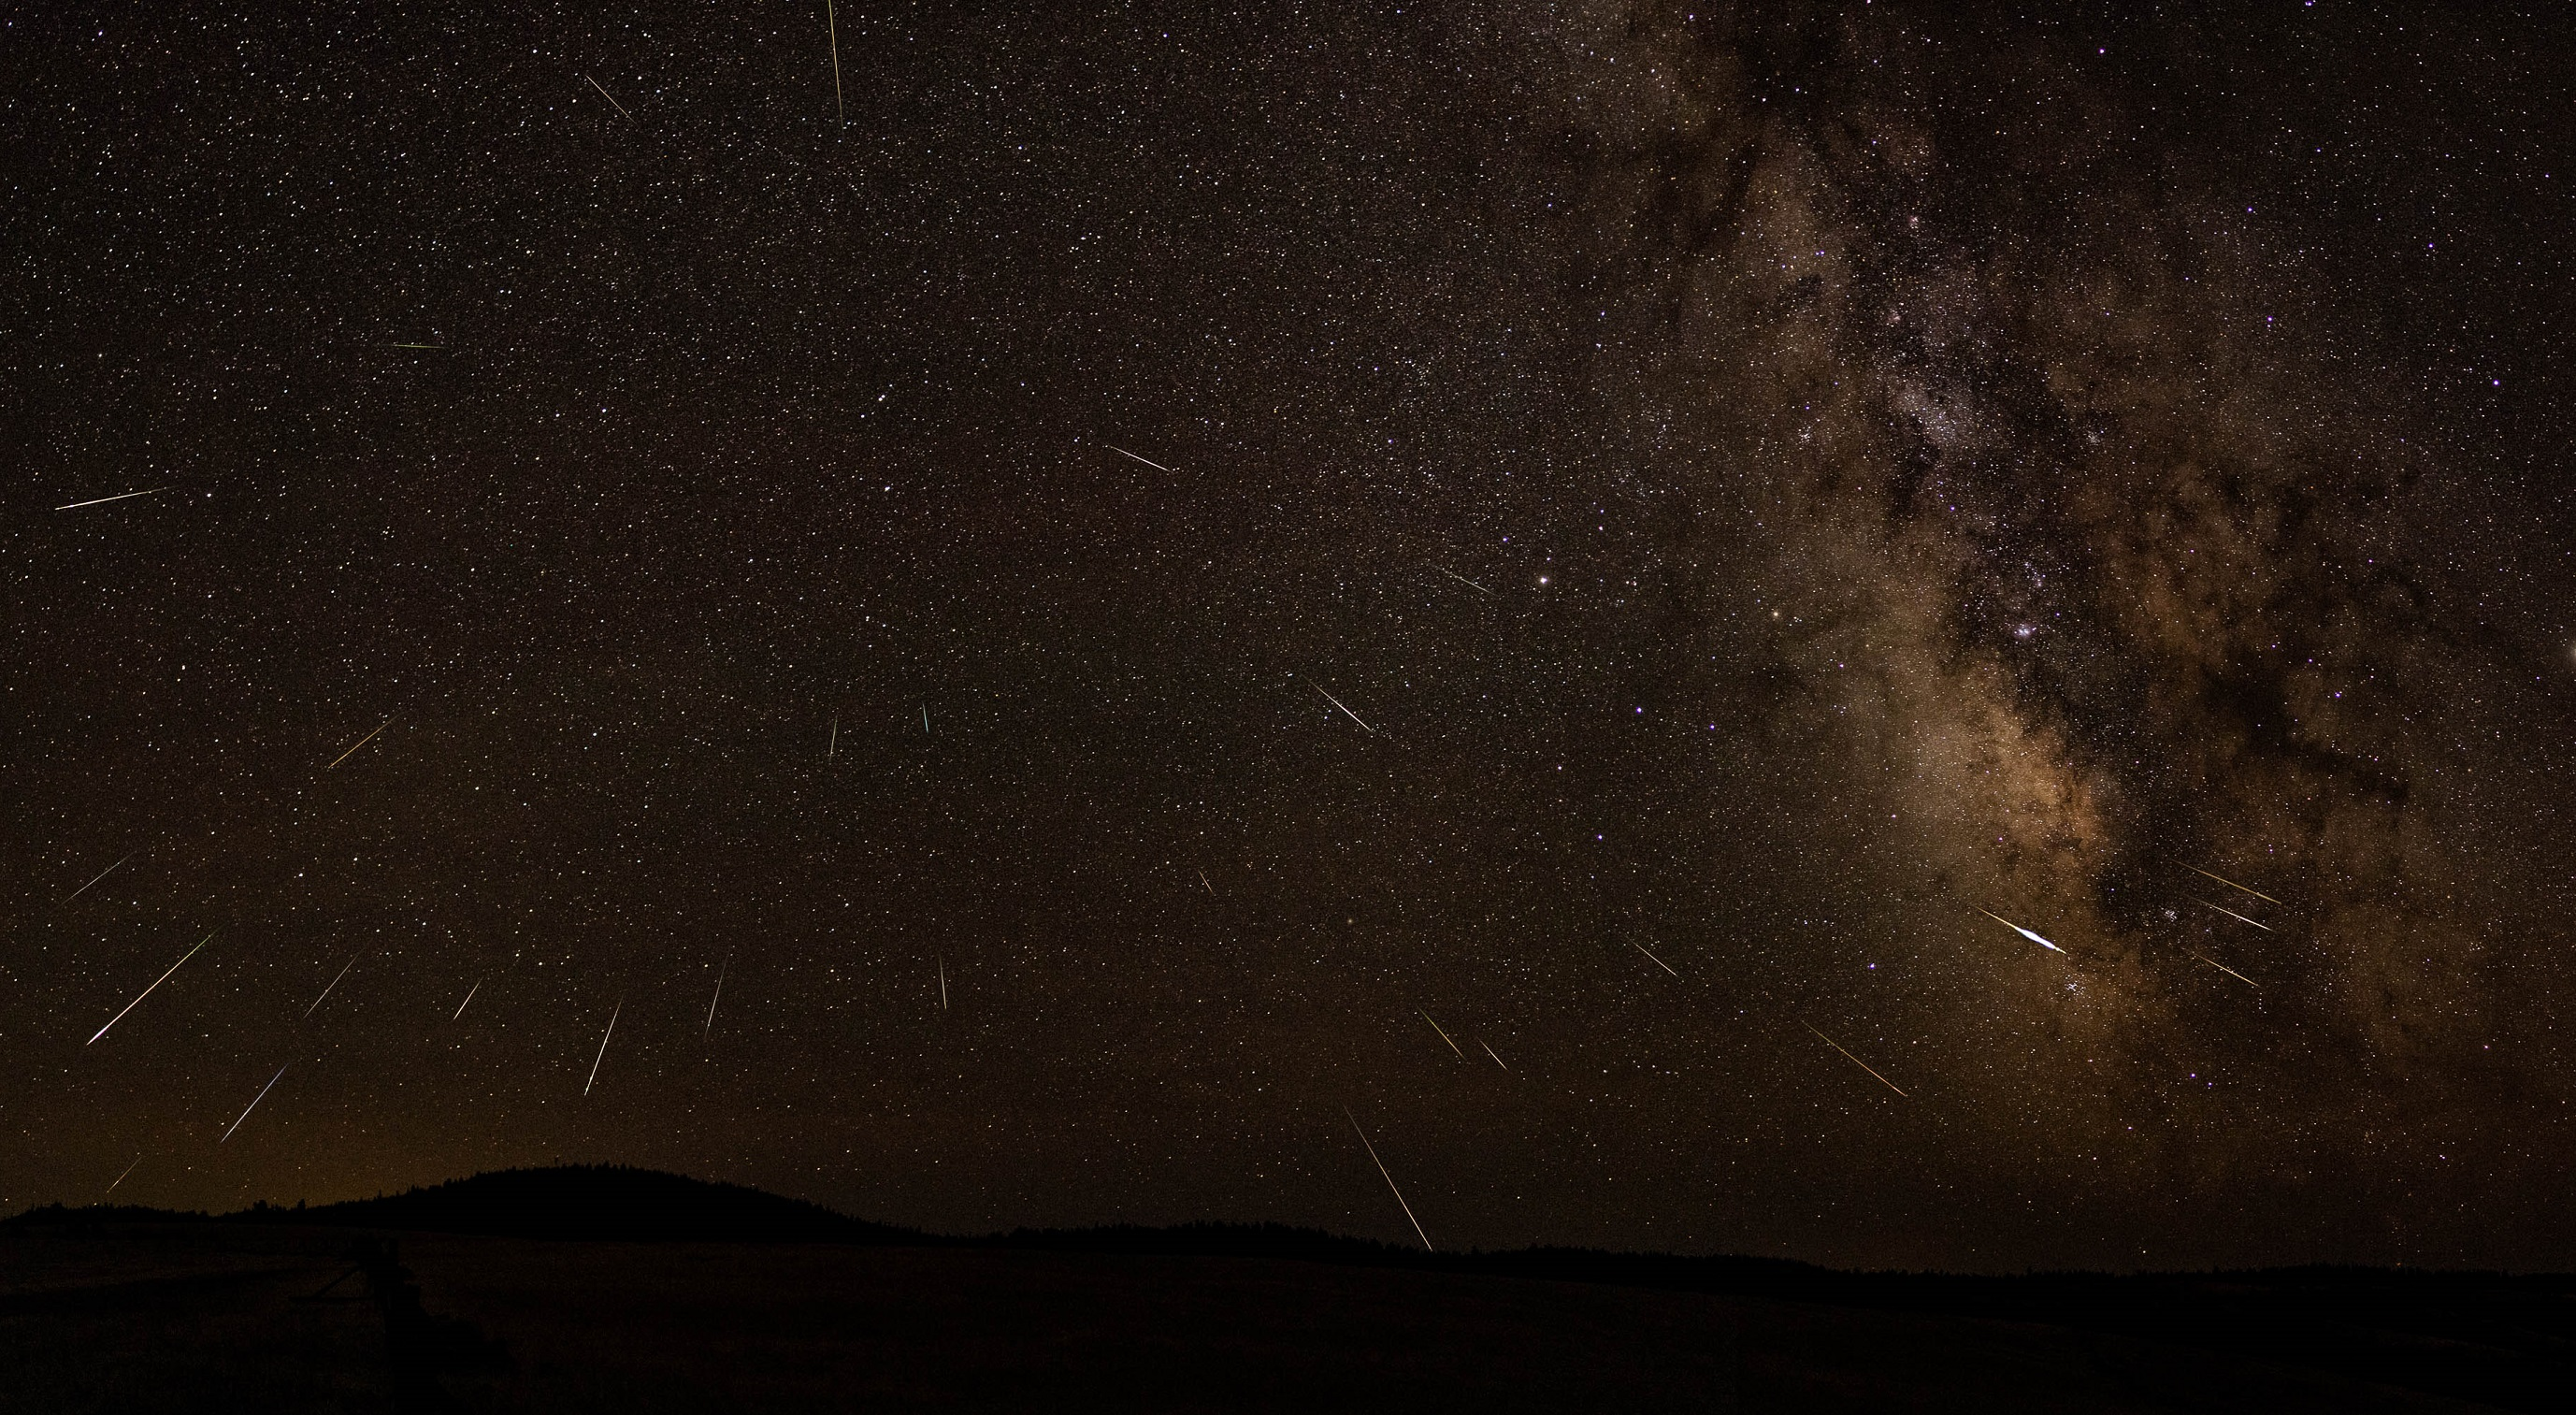 2012 Ursid Meteor Shower - American Meteor Society